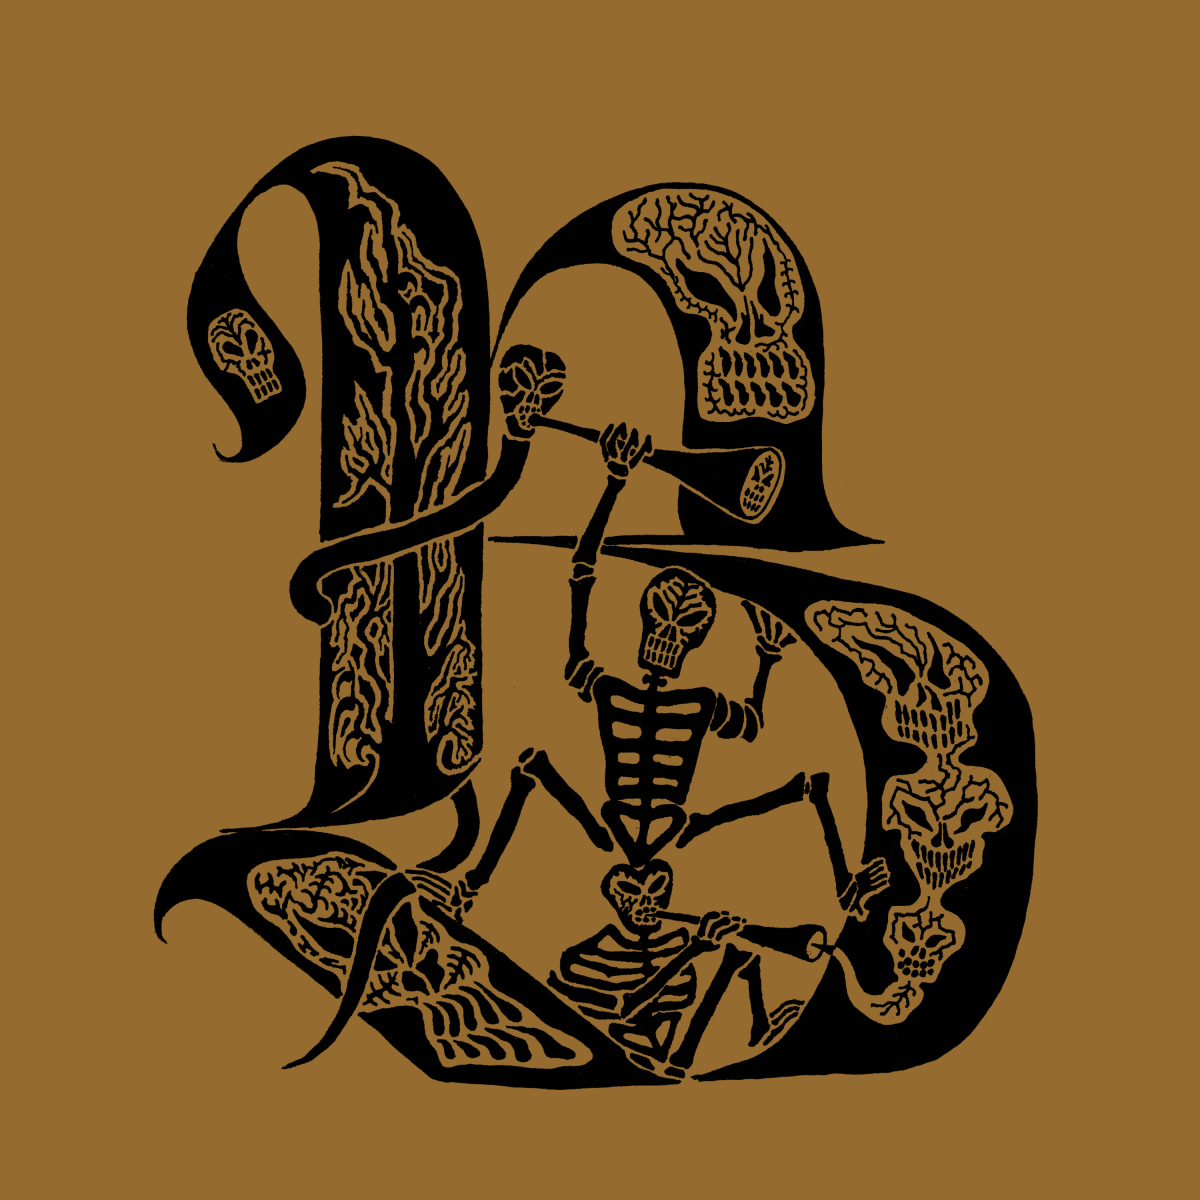 Bastarda - Ars moriendi